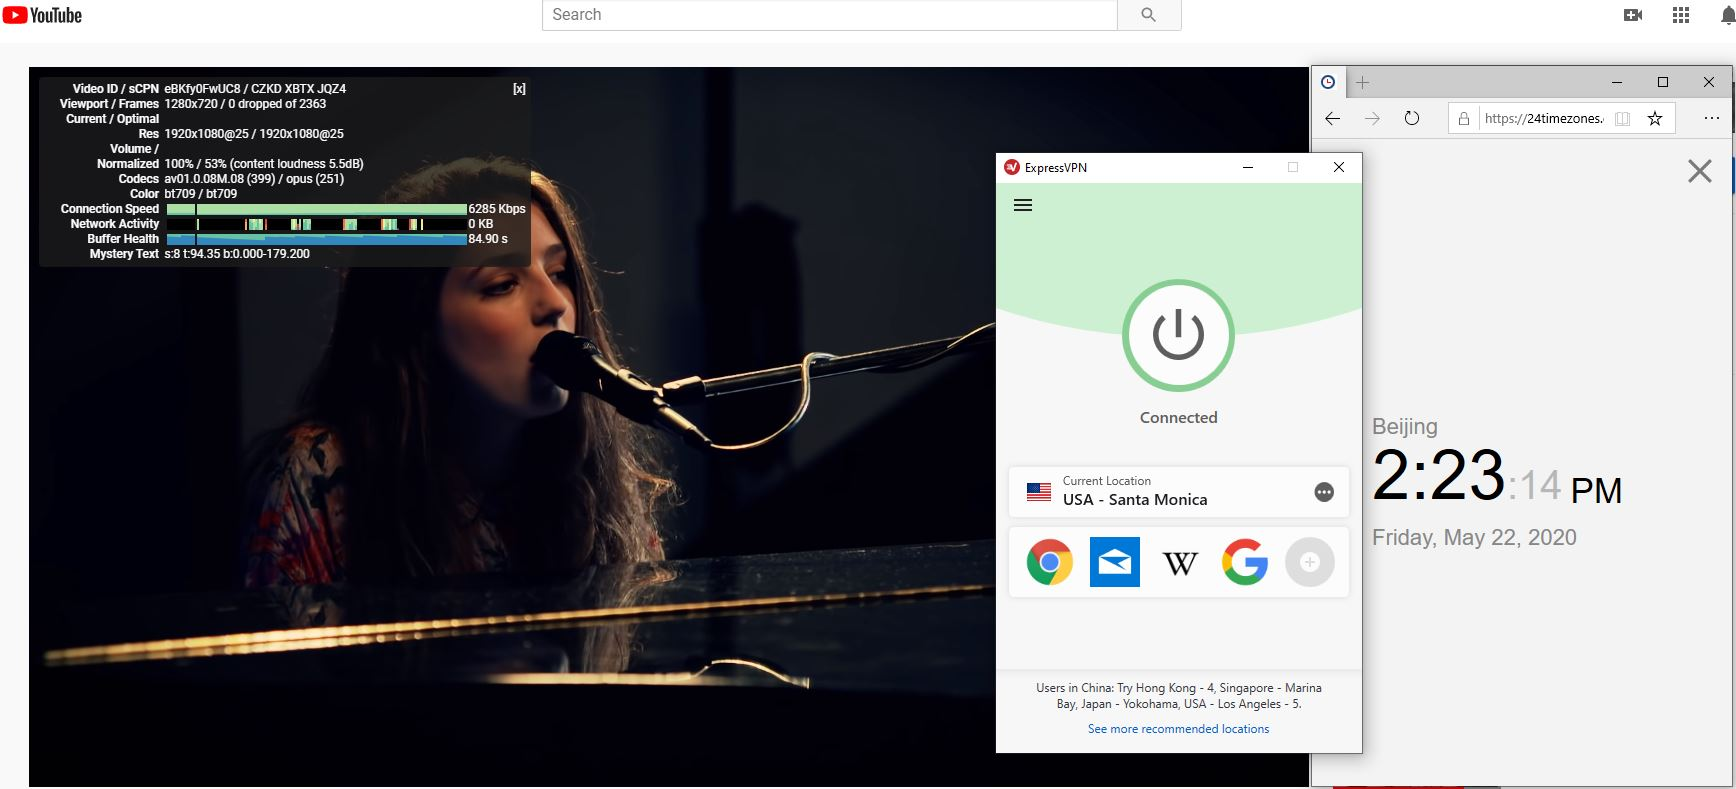 Windows10 ExpressVPN USA - Santa Monica 中国VPN 翻墙 科学上网 youtube测速-20200522